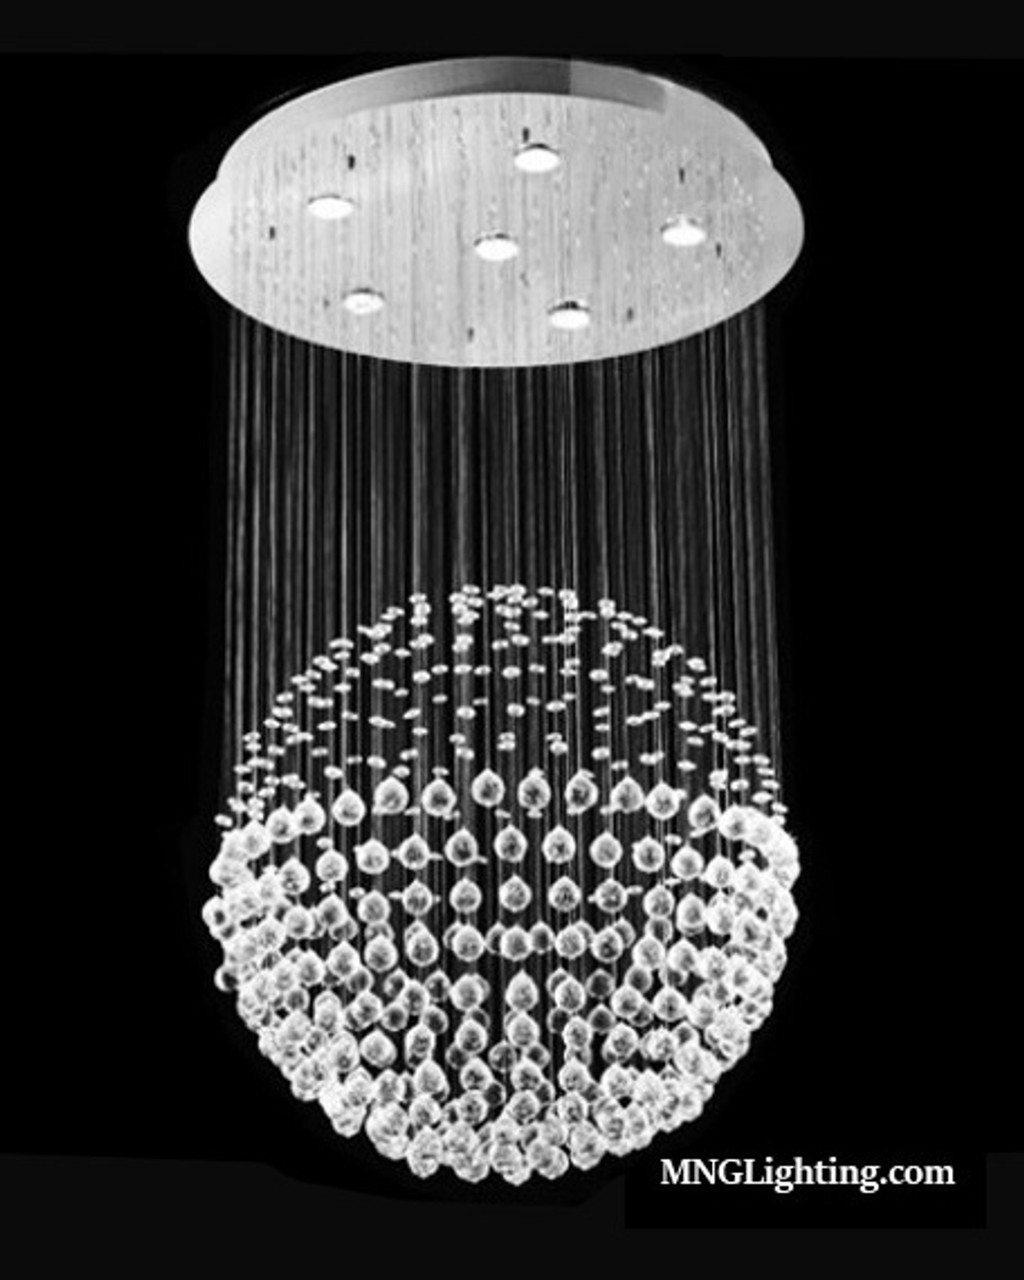 6 Light Ball Sphere Modern Crystal Chandelier Lighting Fixture Mc53066 Modern Chandeliers Montreal Laval Brossard Ottawa Canada Usa Online Sale